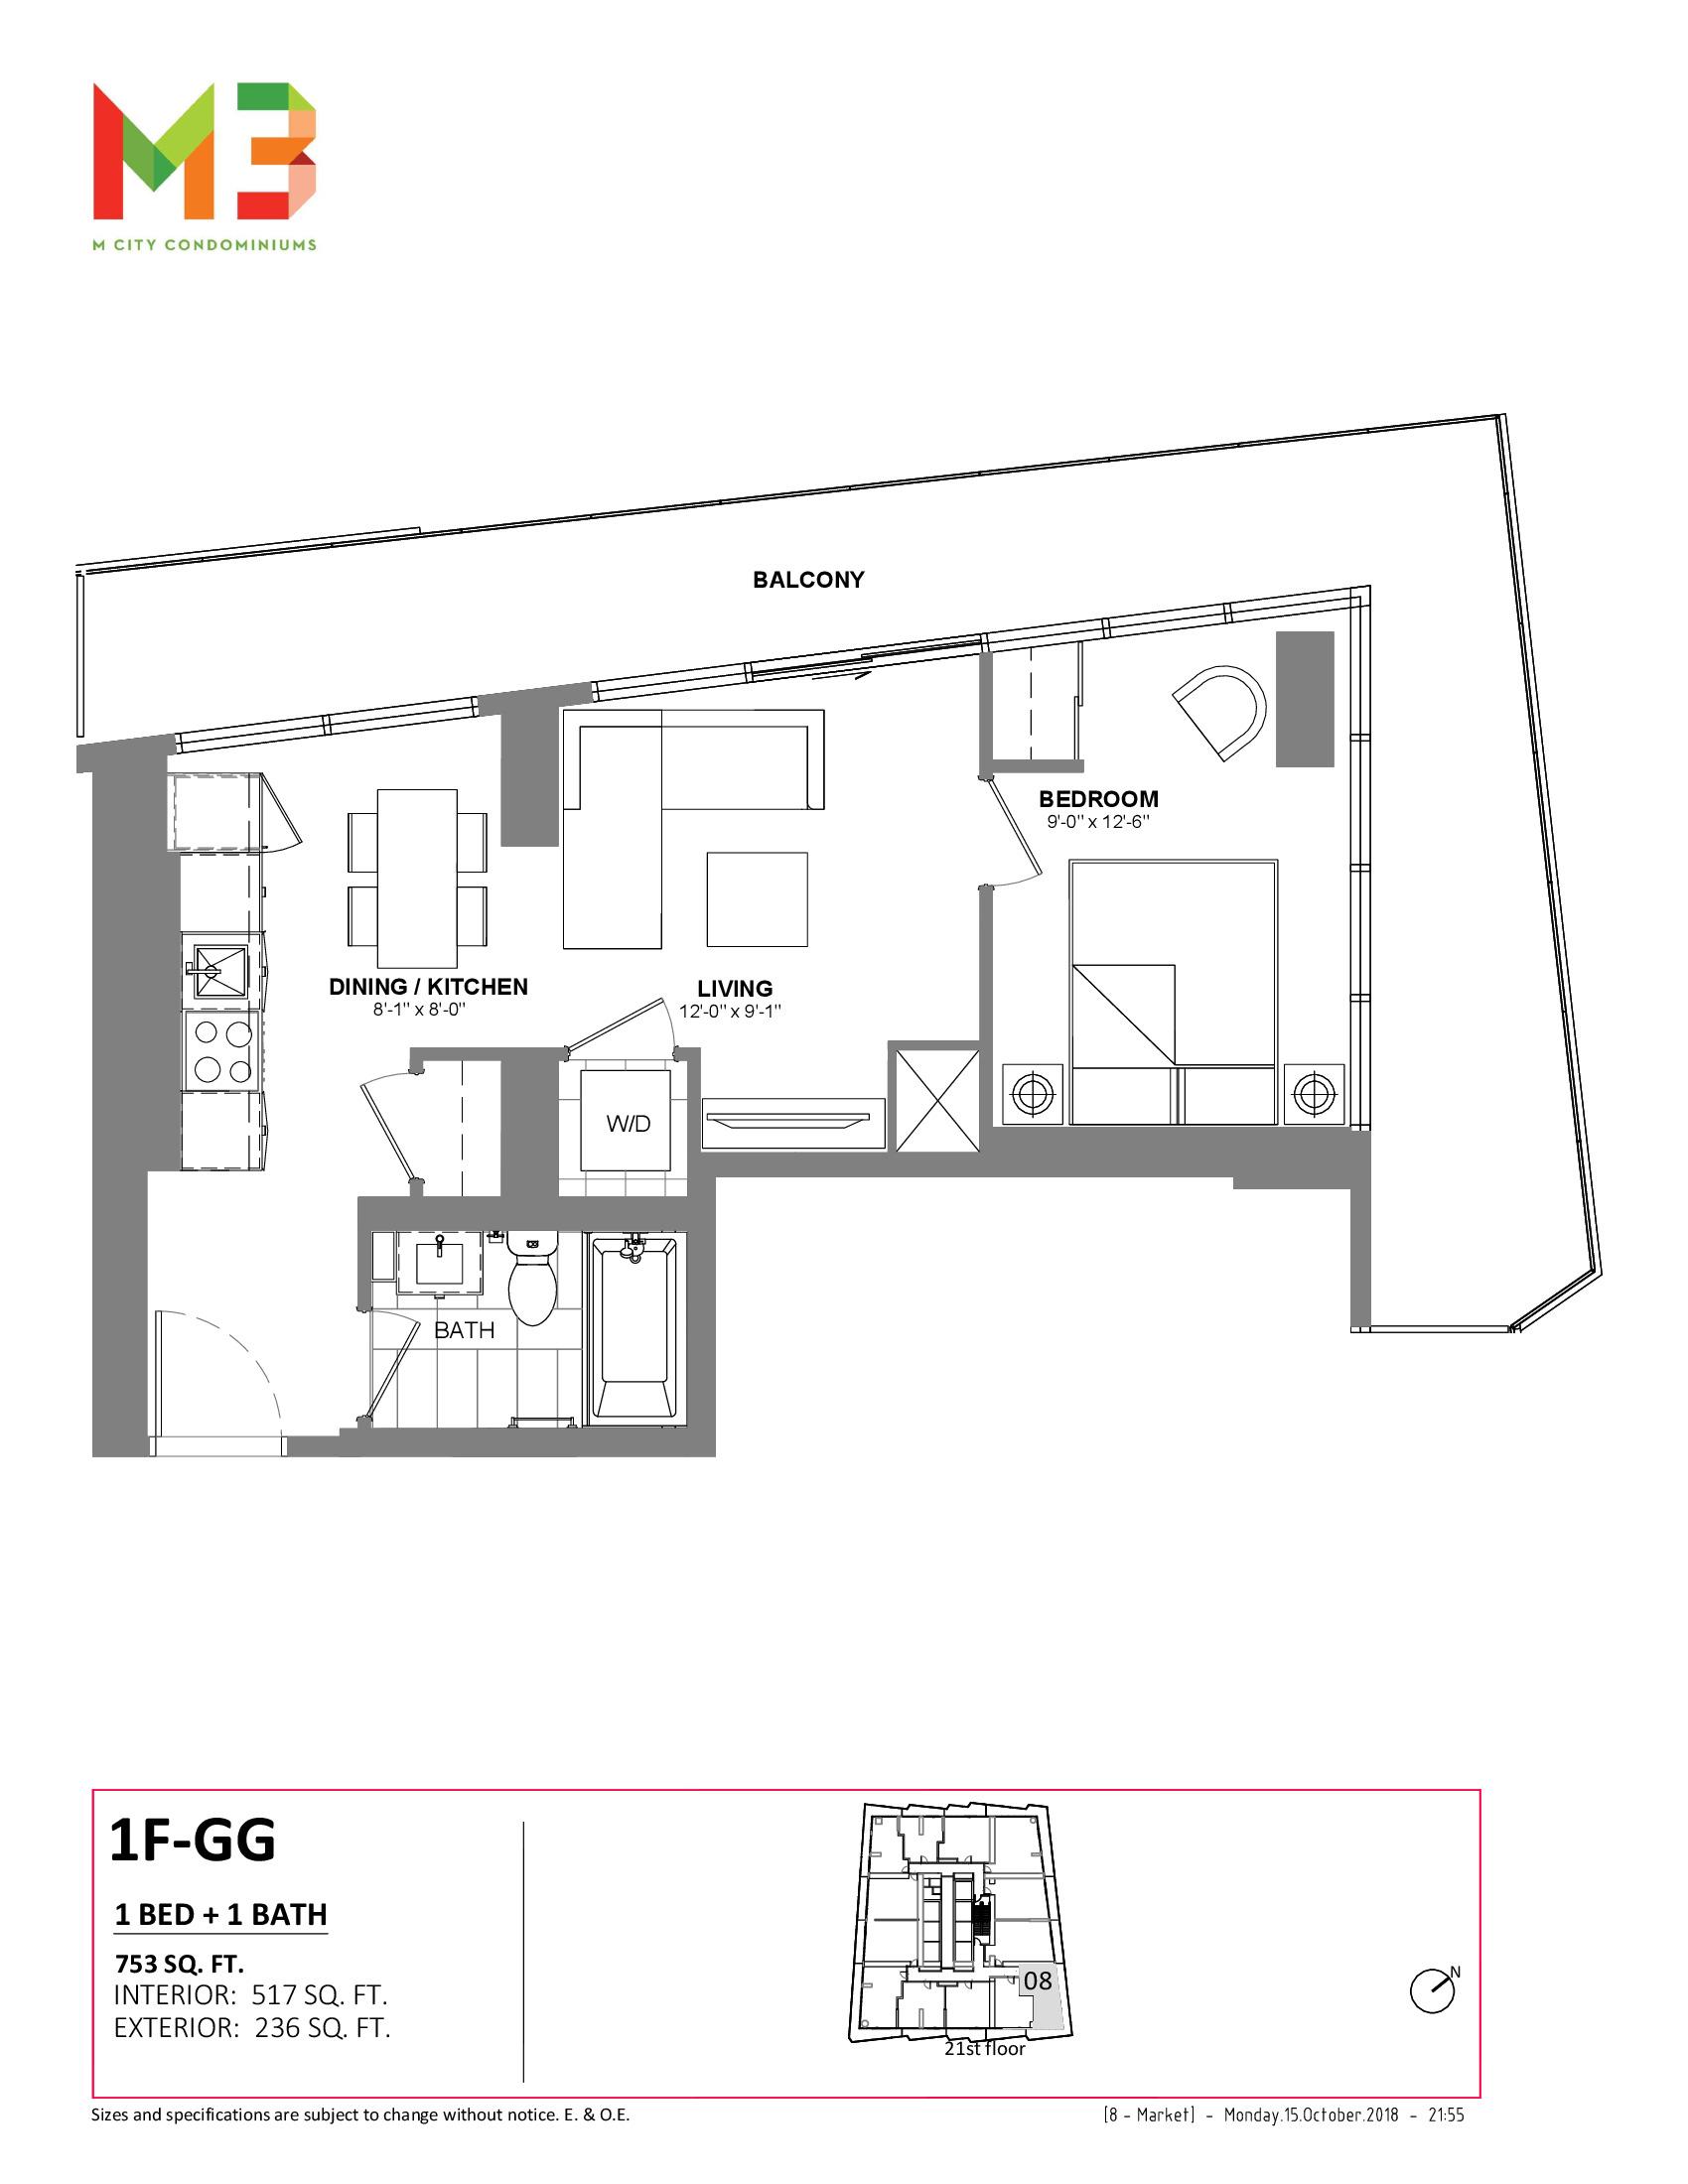 1F-GG Floor Plan at M3 Condos - 517 sq.ft